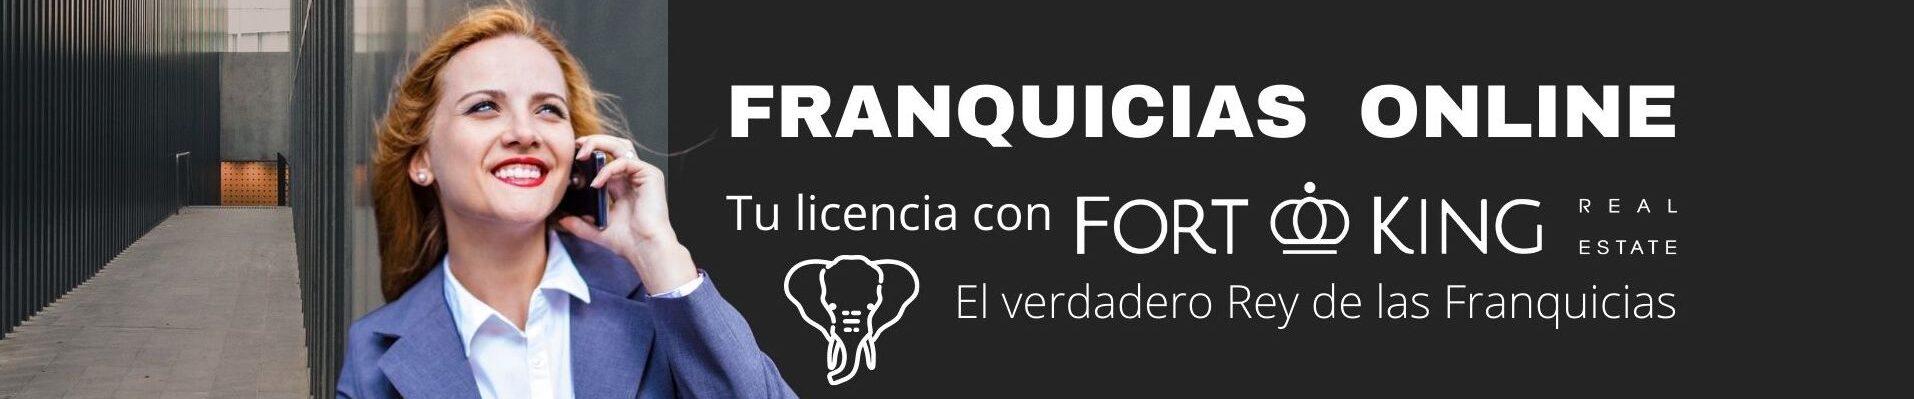 FRANQUICIAS FORT KING REAL ESTATE